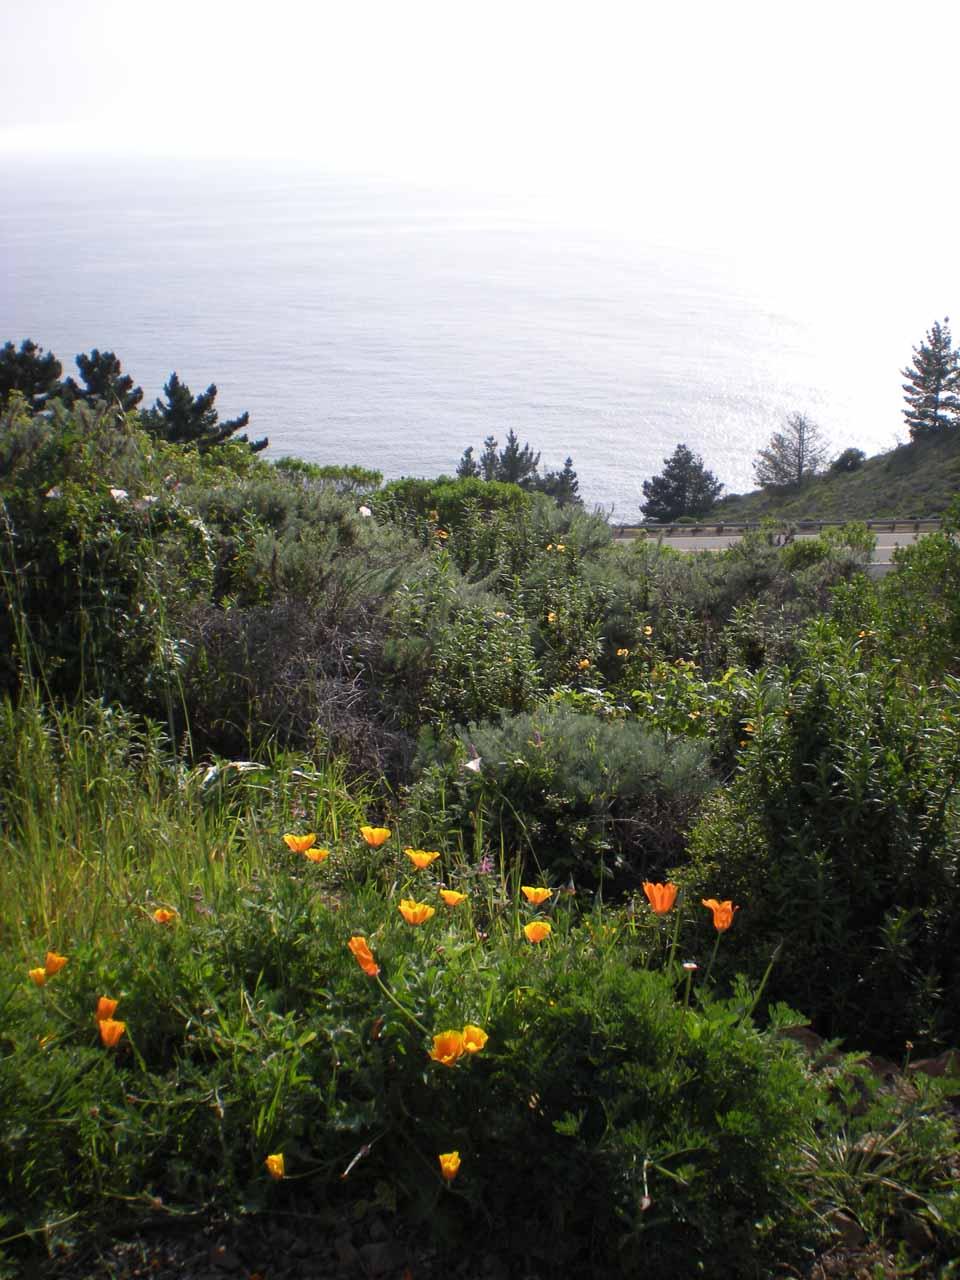 Ocean view from Treebones